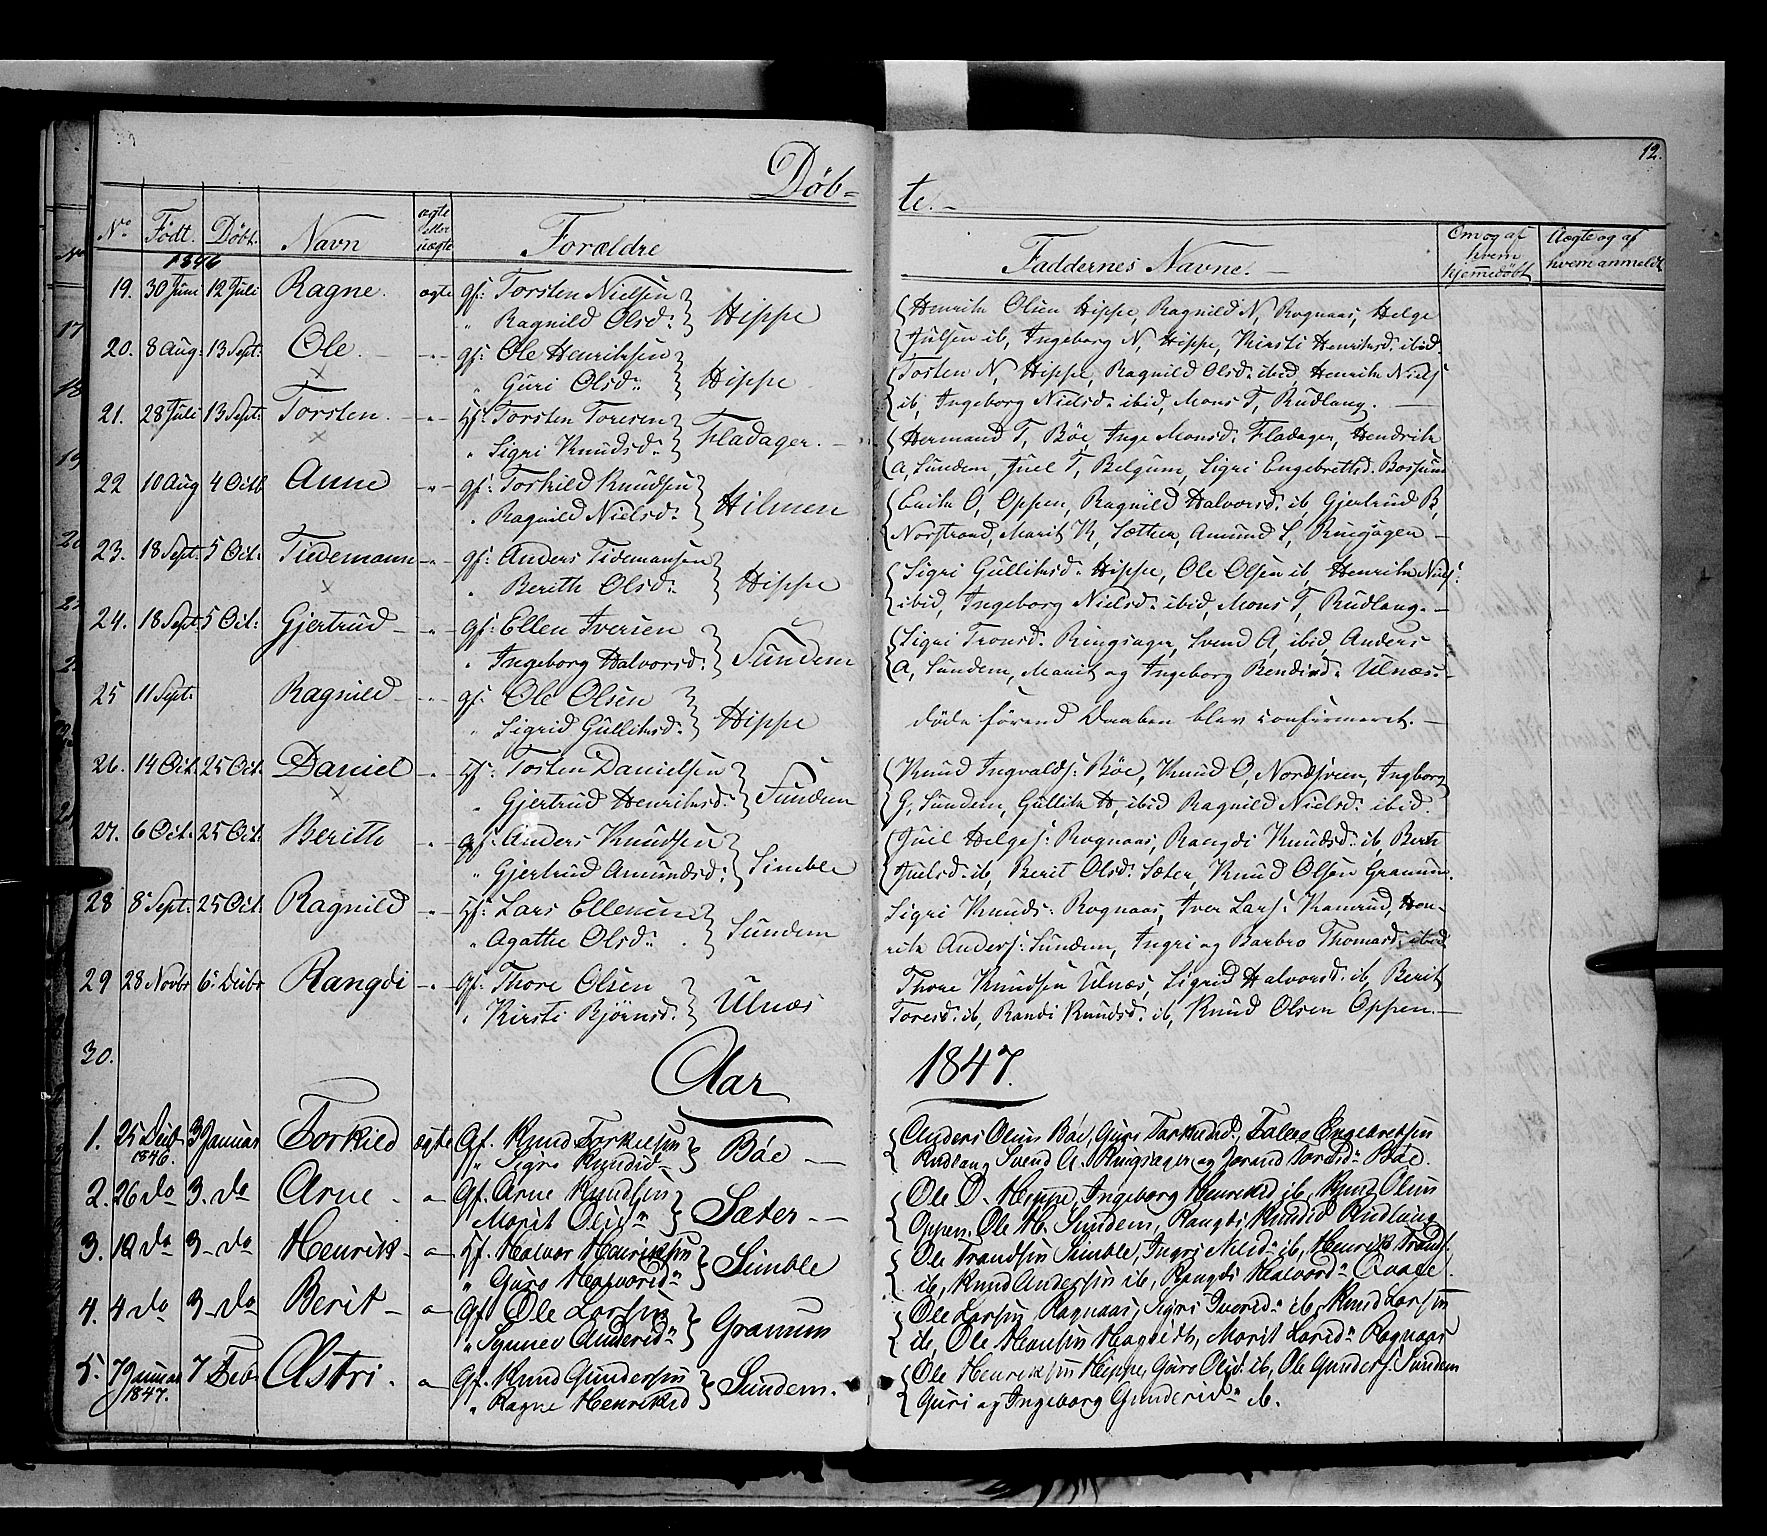 SAH, Nord-Aurdal prestekontor, Ministerialbok nr. 6, 1842-1863, s. 12